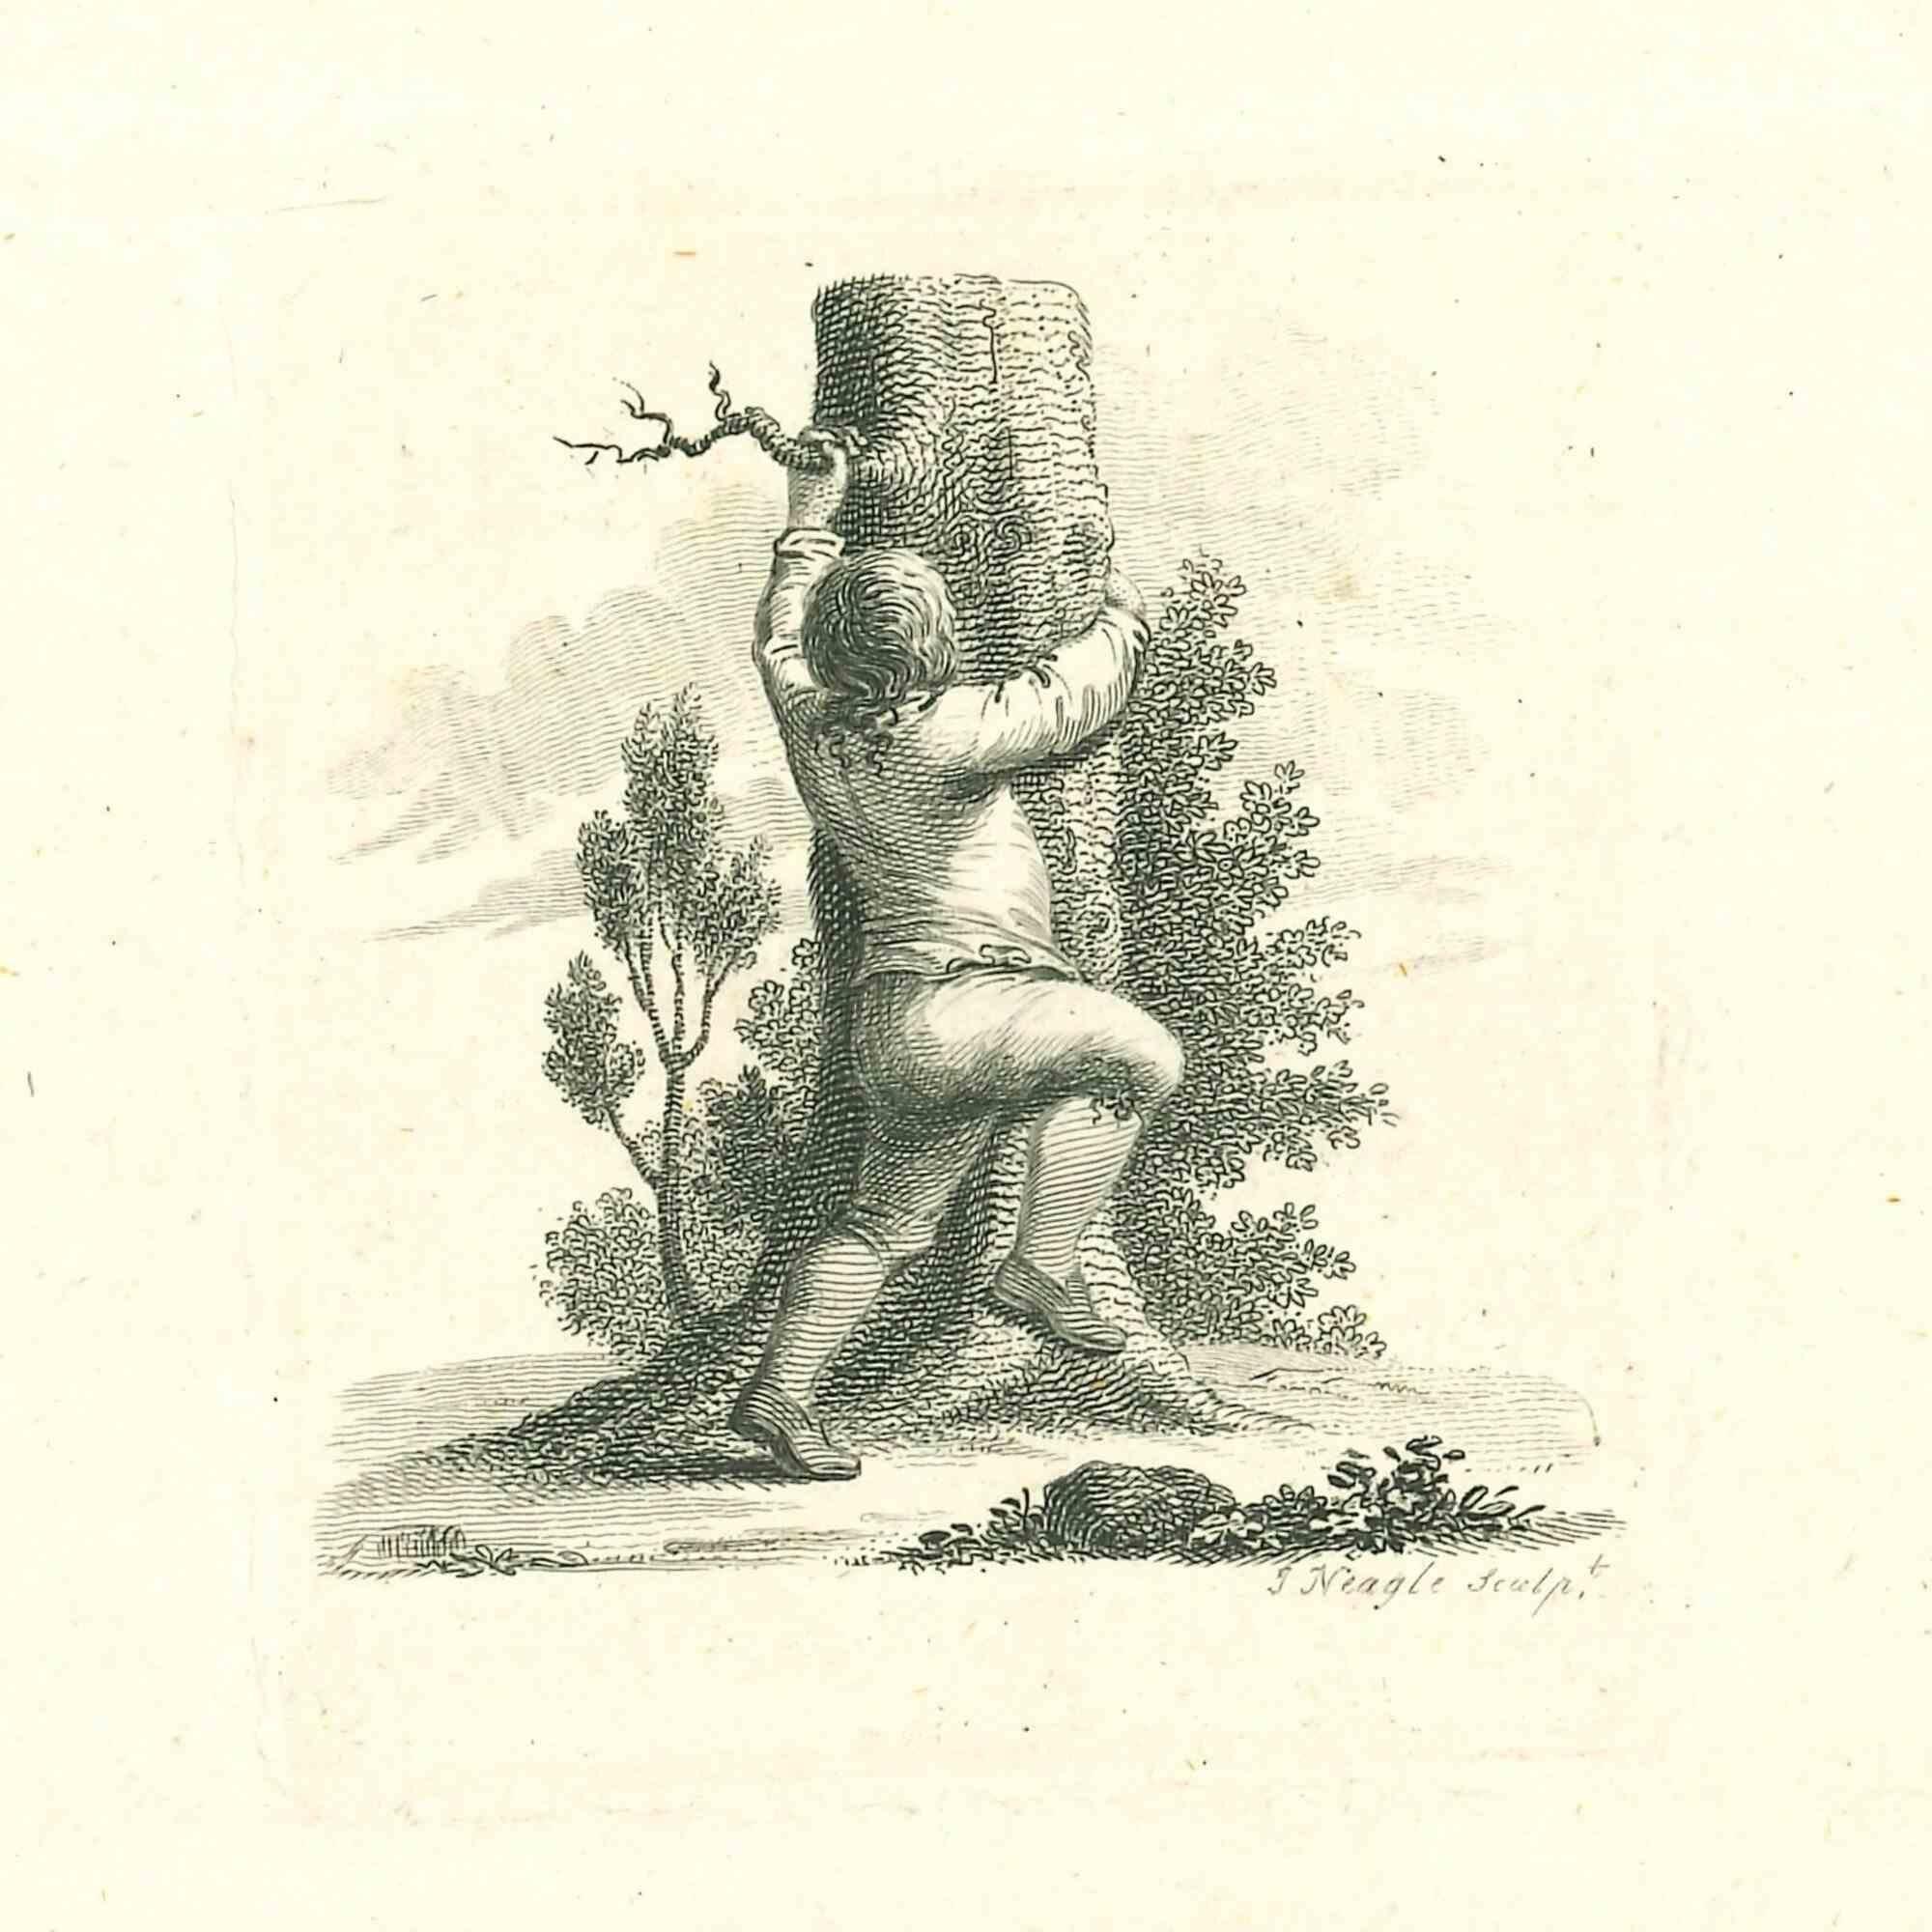 A Boy Climbing a Tree - Original Etching by James Neagle - 1810